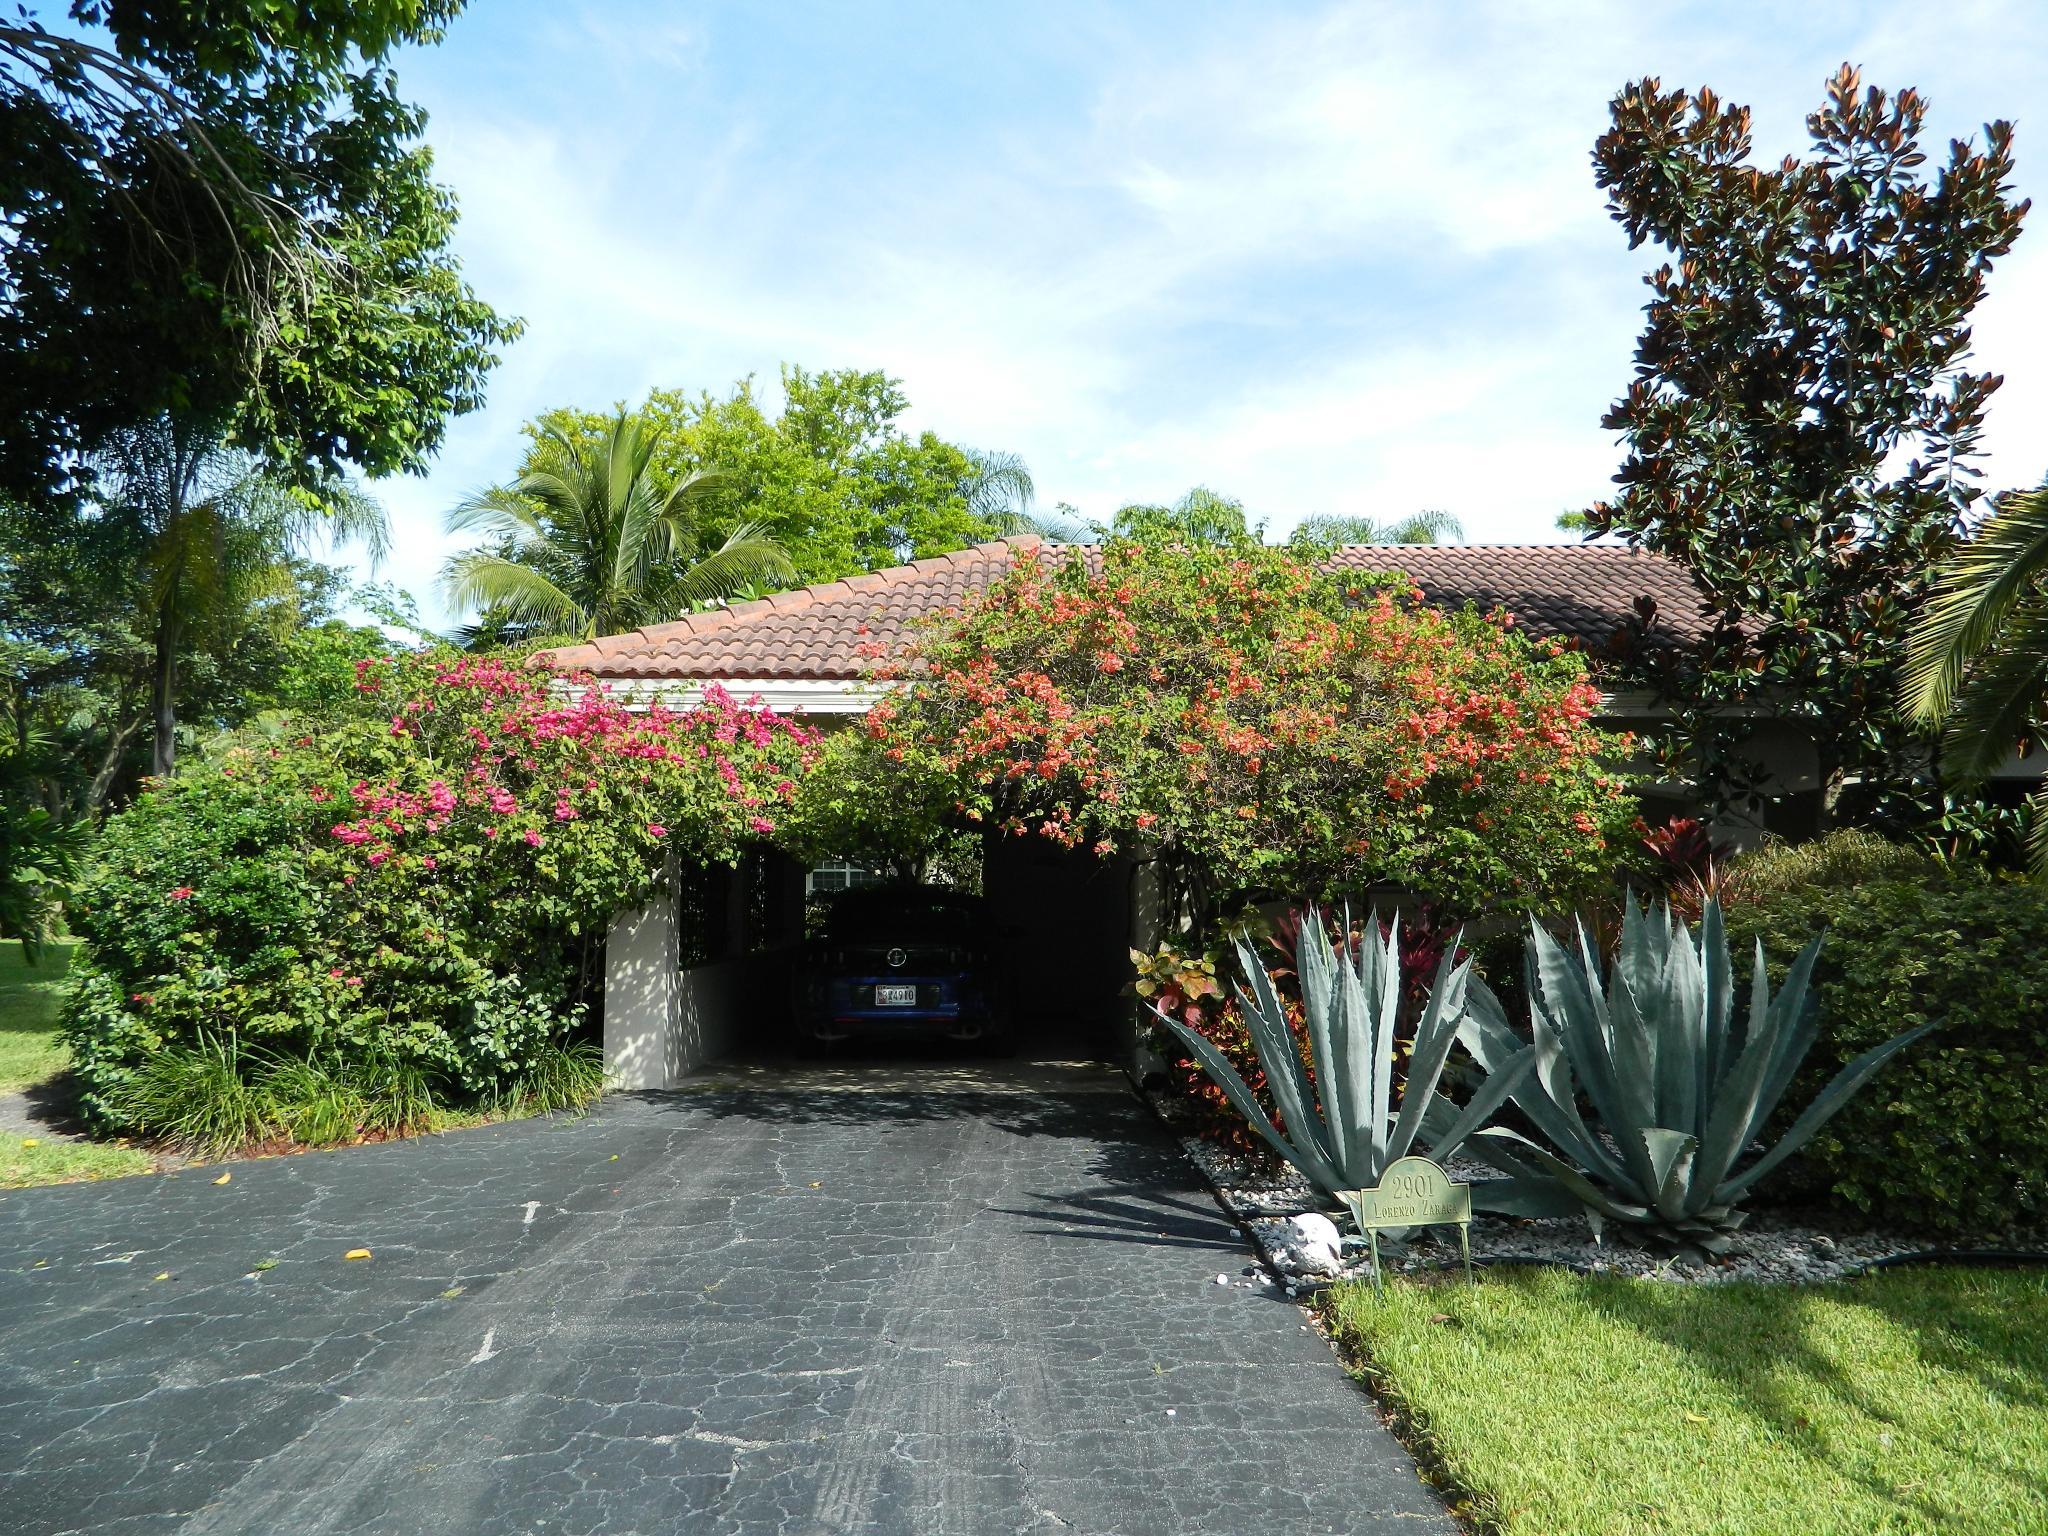 2901 N Palm Aire Dr, Pompano Beach, FL 33069 - Estimate and Home ...